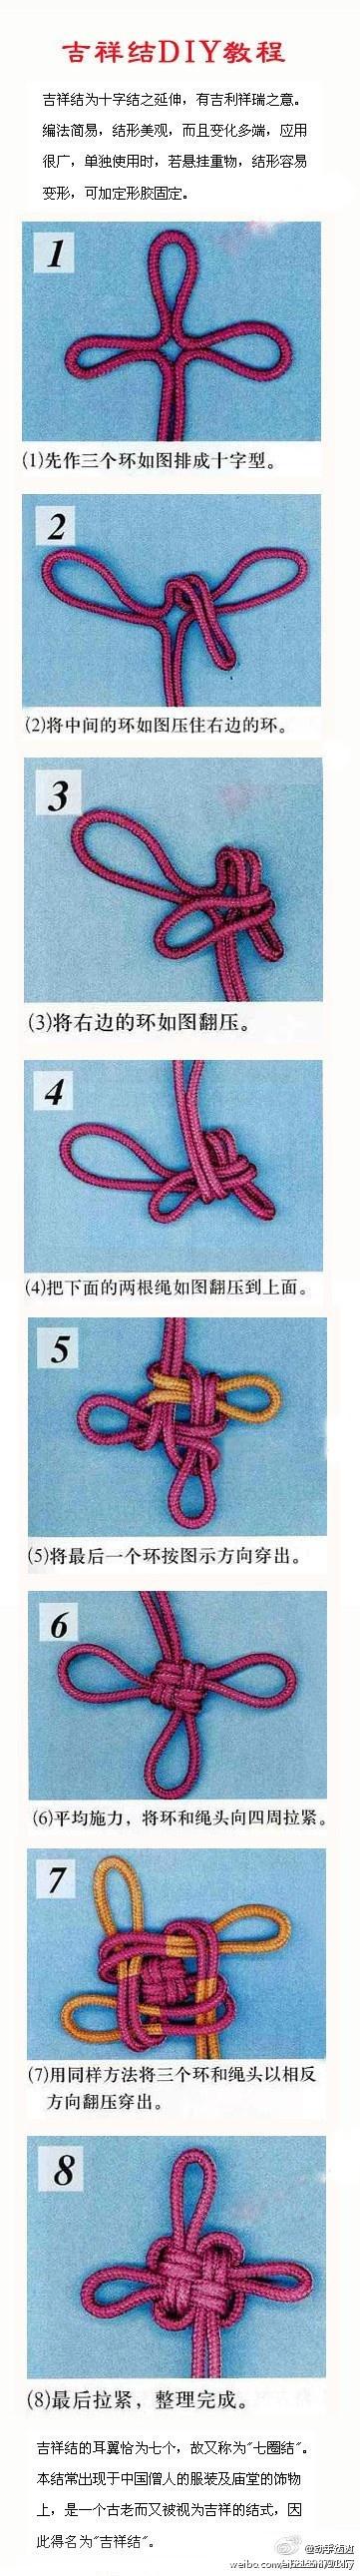 more knots